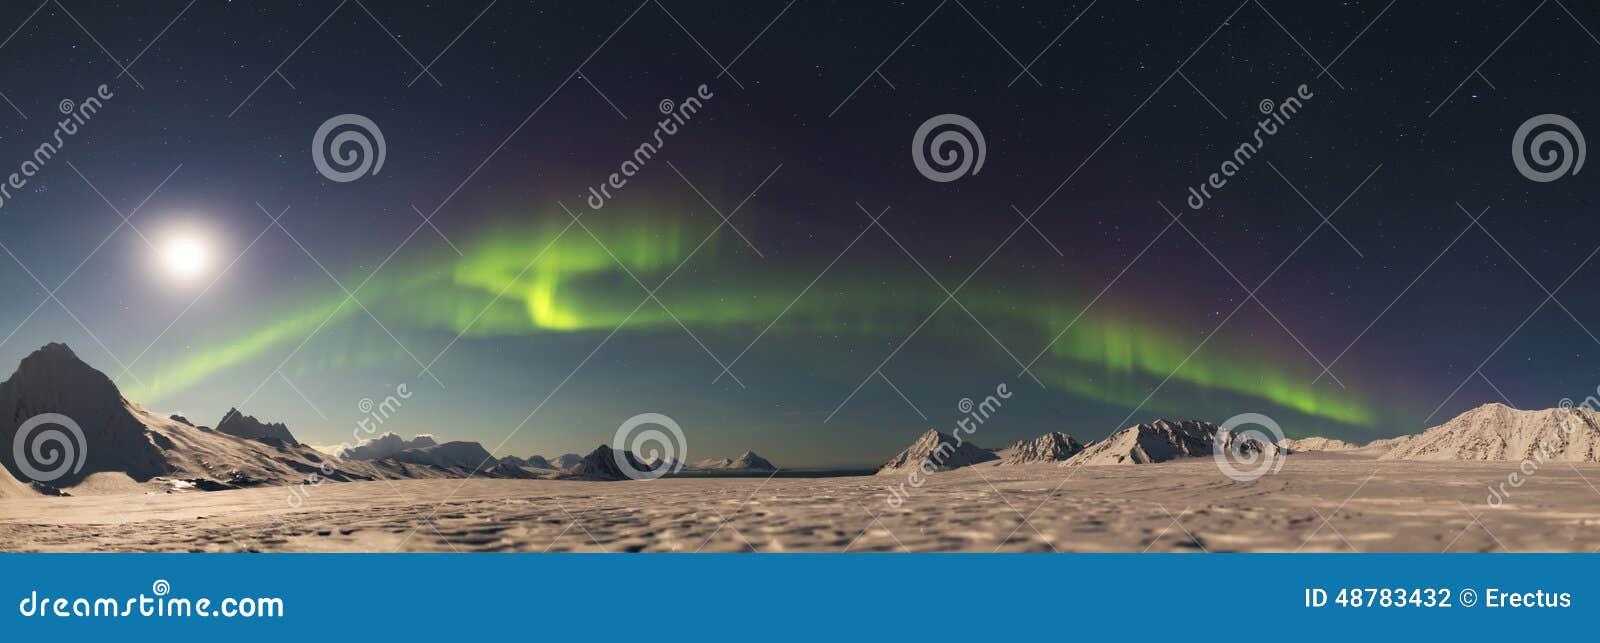 PANORAMA - Northern Lights above the Arctic glacier - Svalbard, Spitsbergen